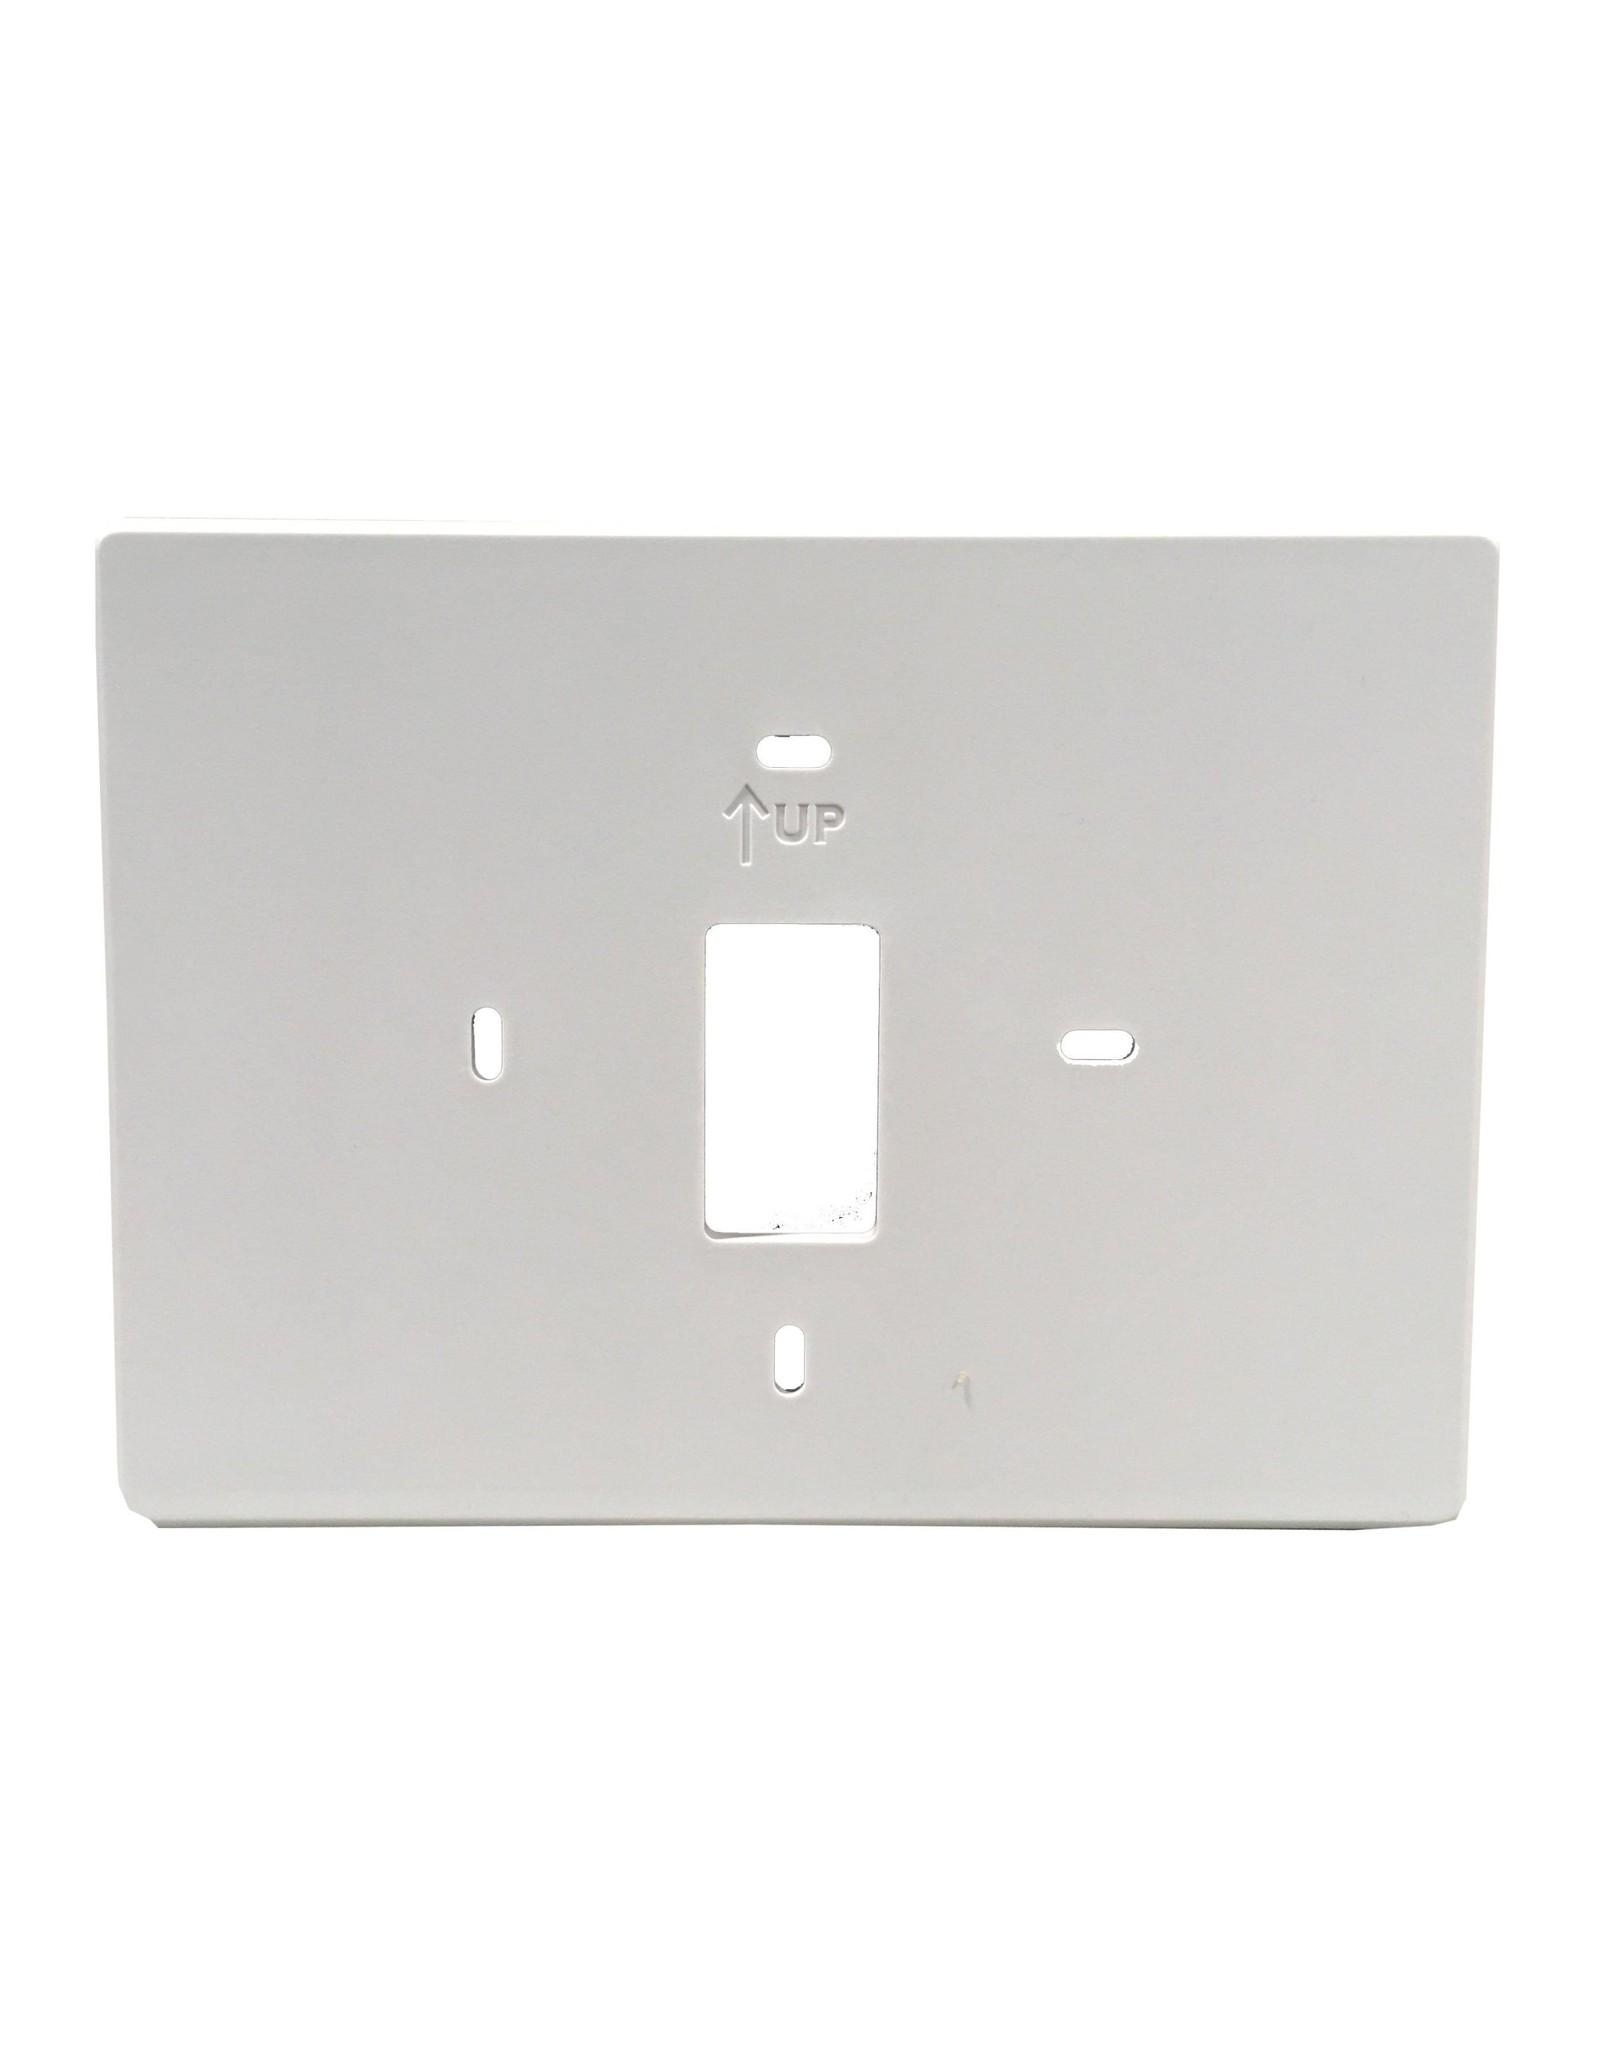 Pro1 Universal Plastic Wall Plate